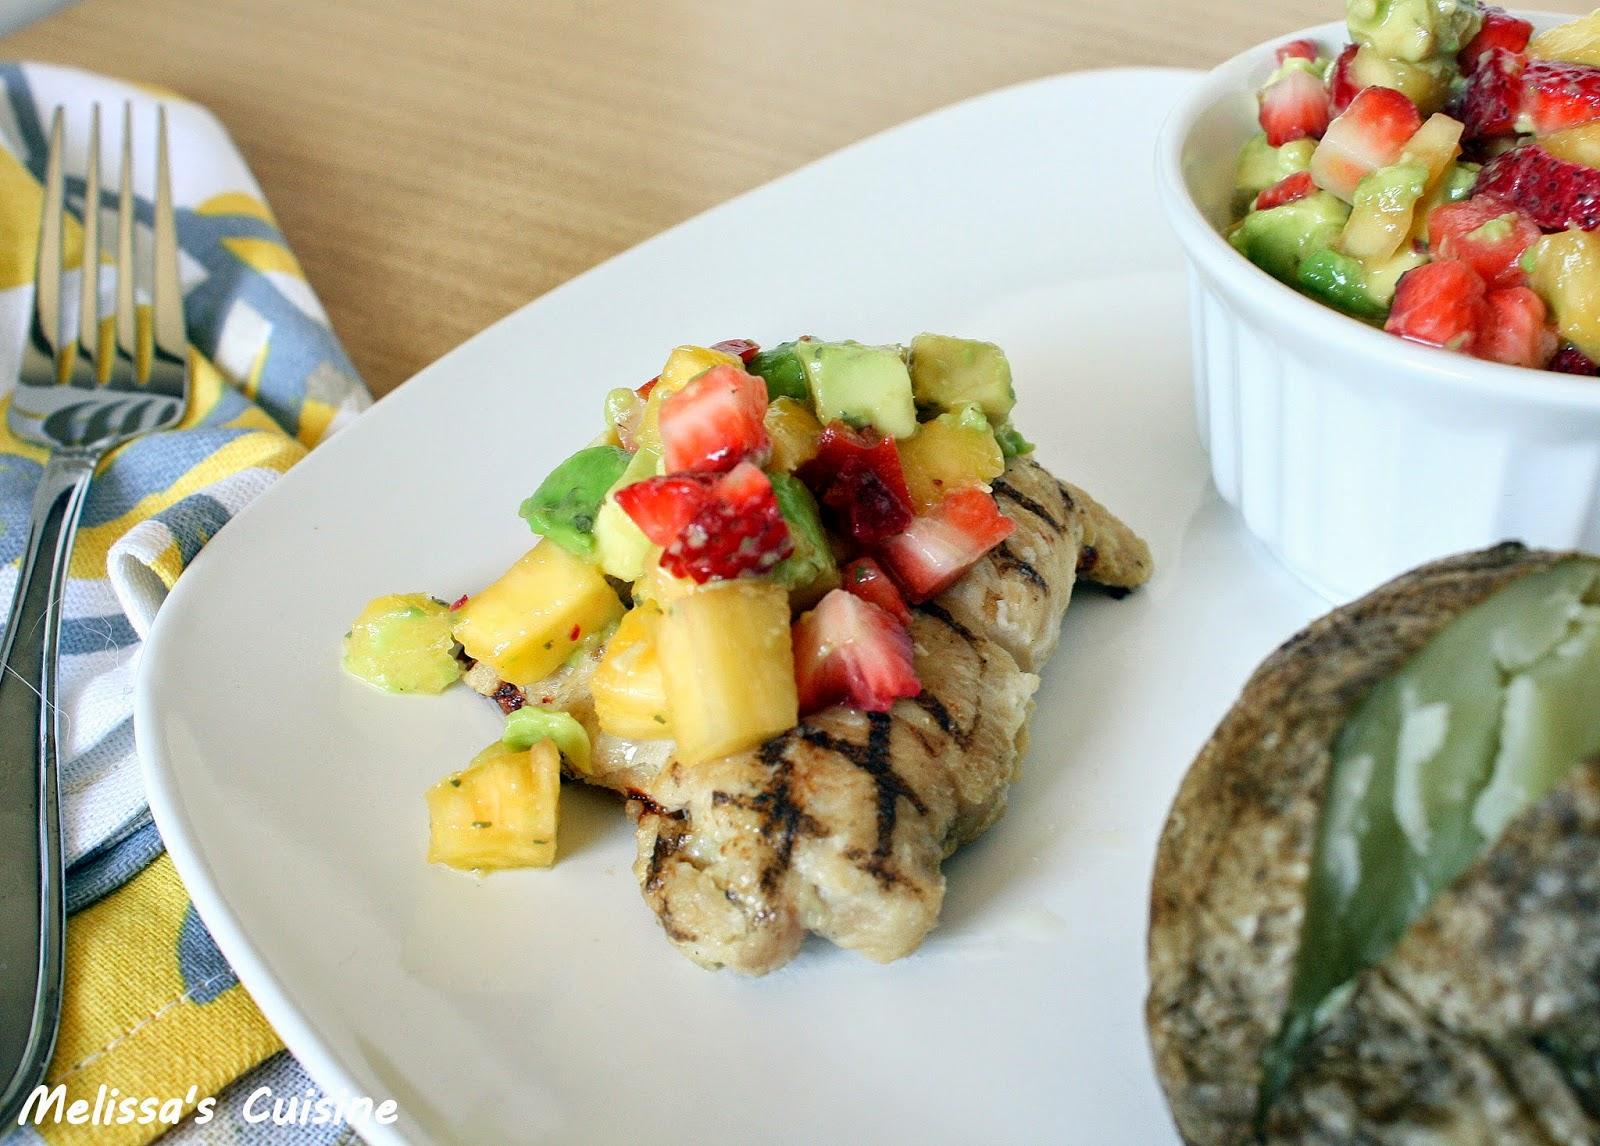 Melissa's Cuisine: Fruit Salsa